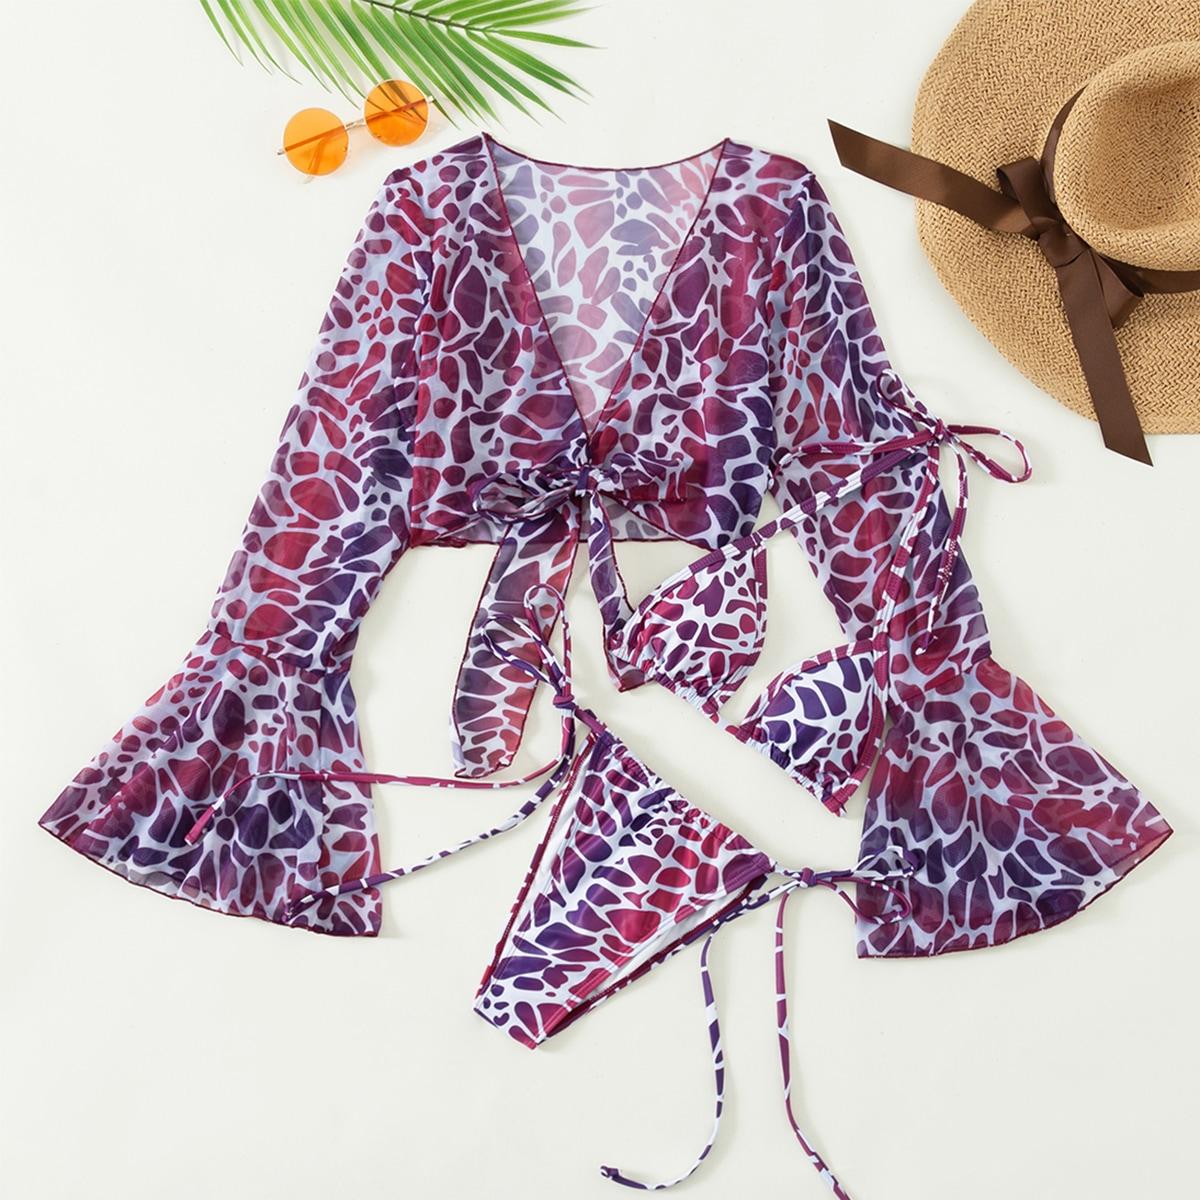 3pack Leopard Bikini Swimsuit & Cover Up